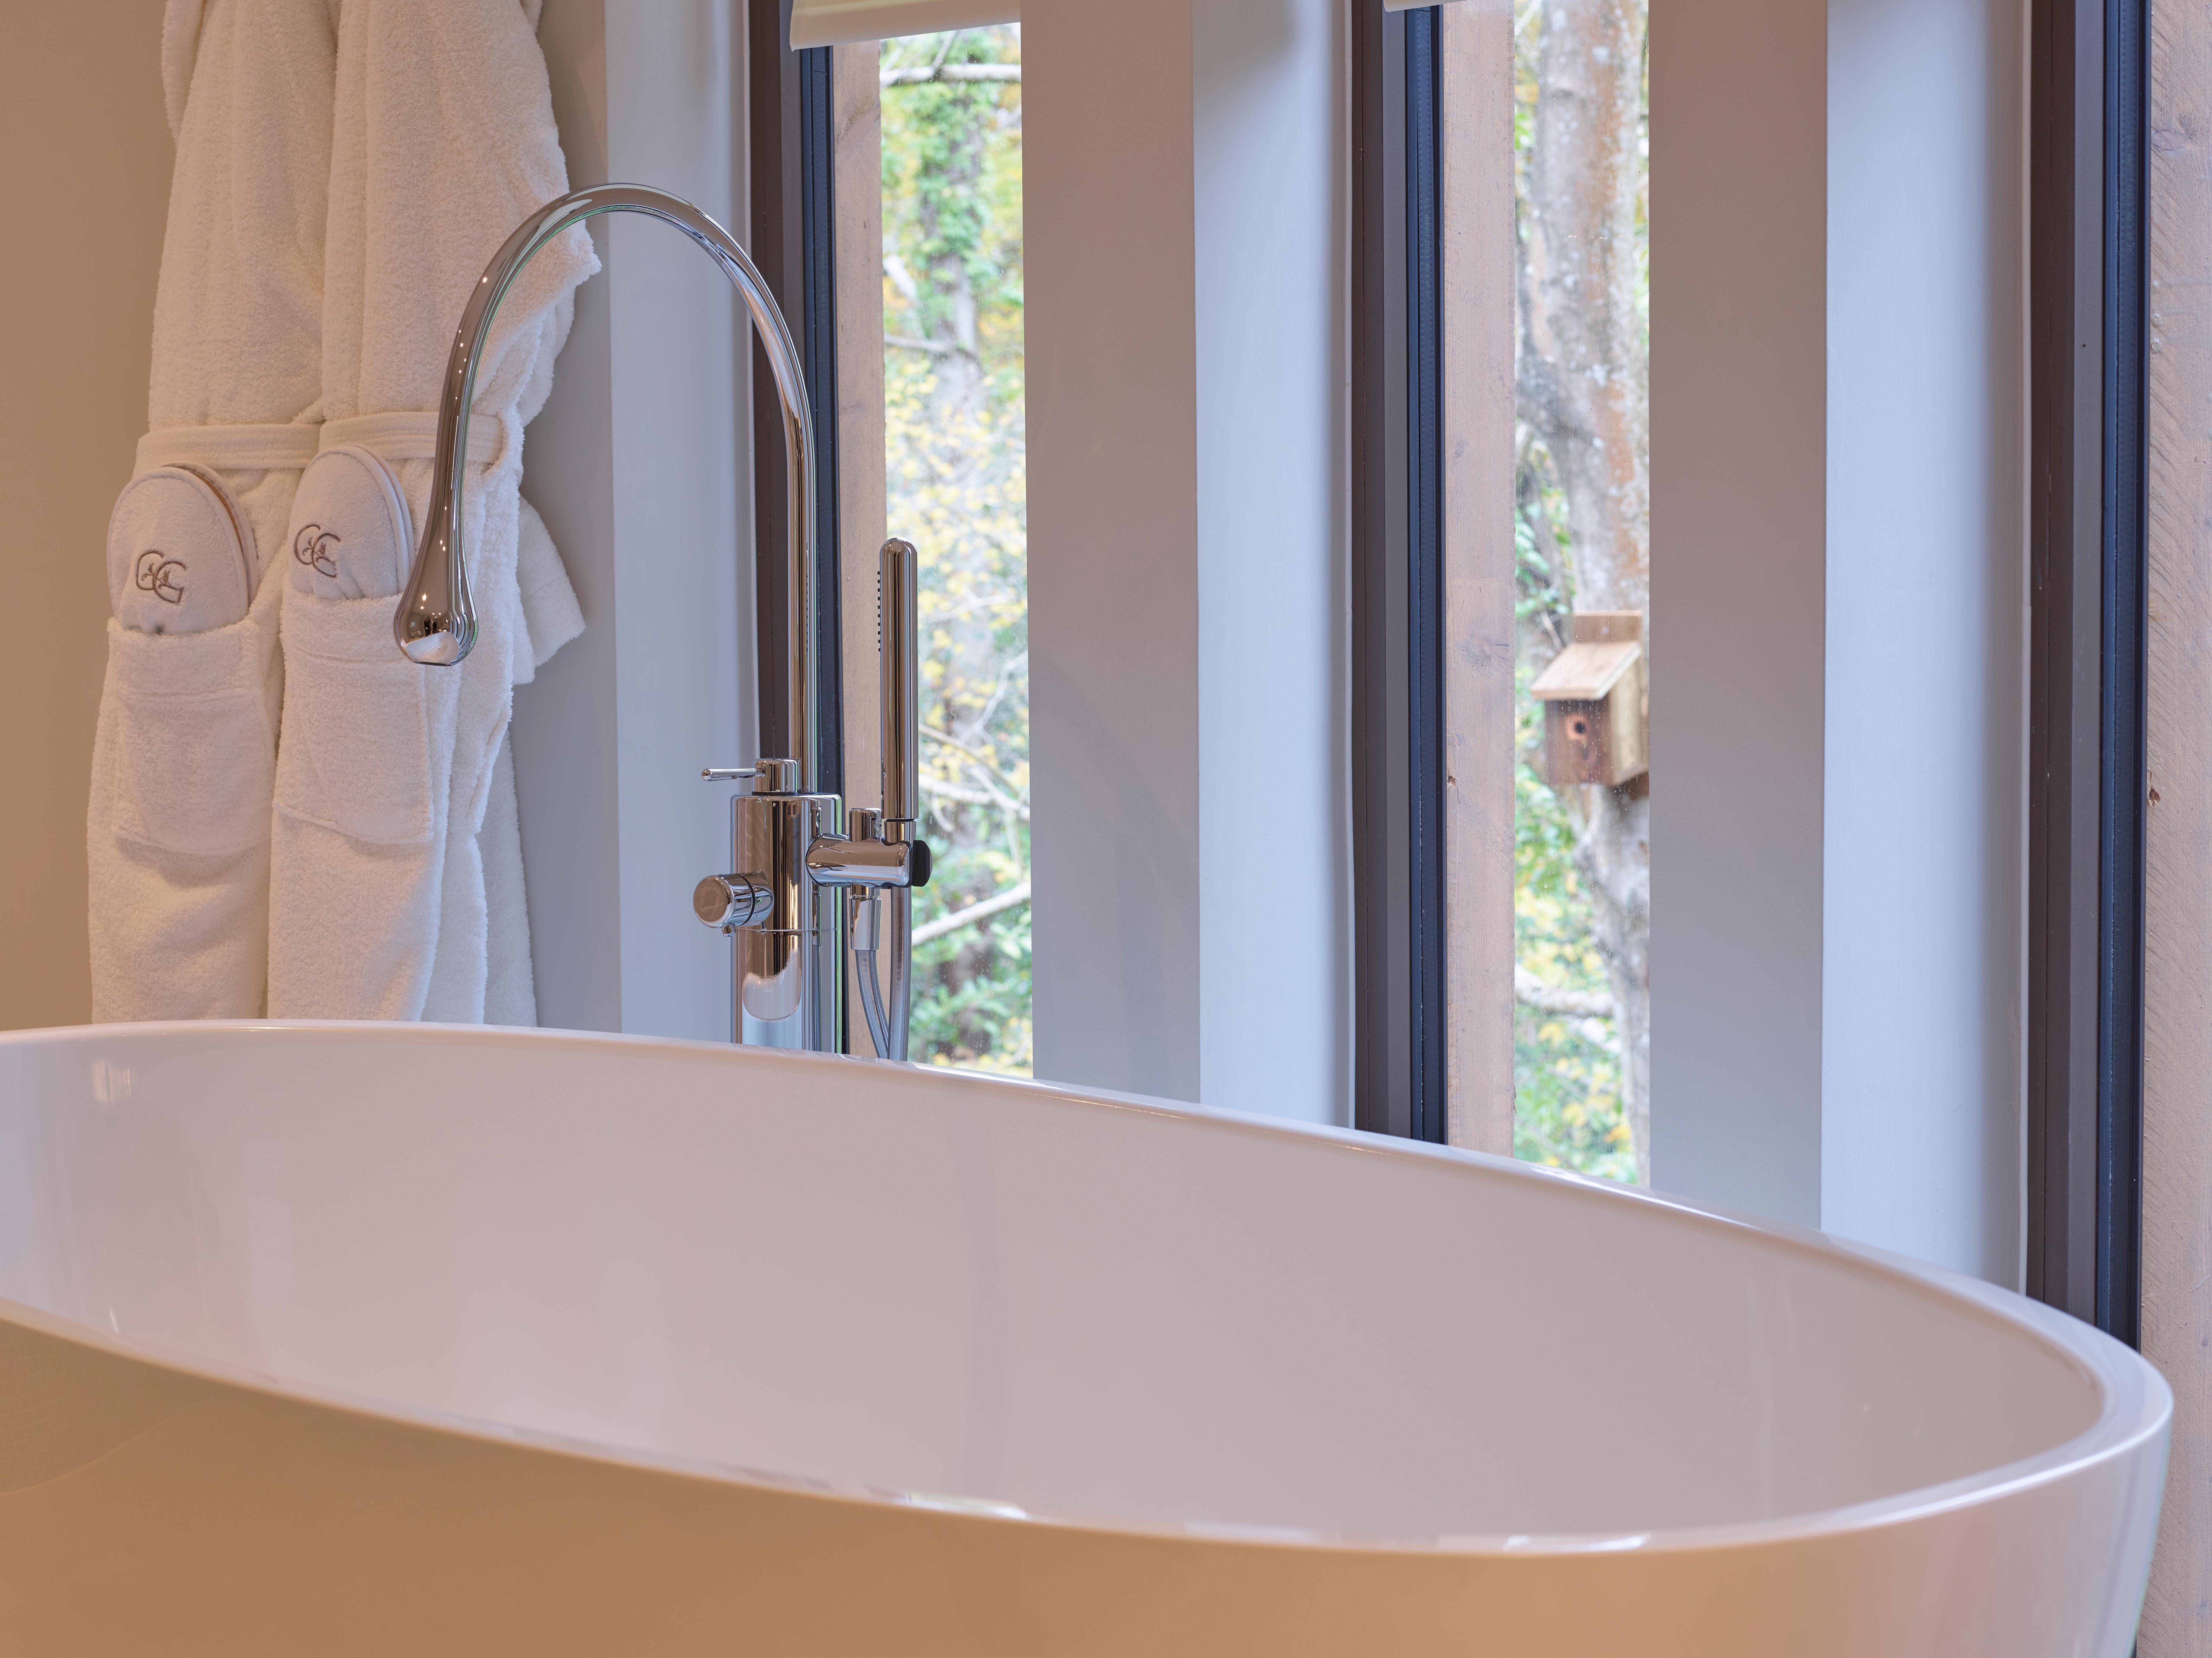 The Yews Treehouse bath Chewton Glen